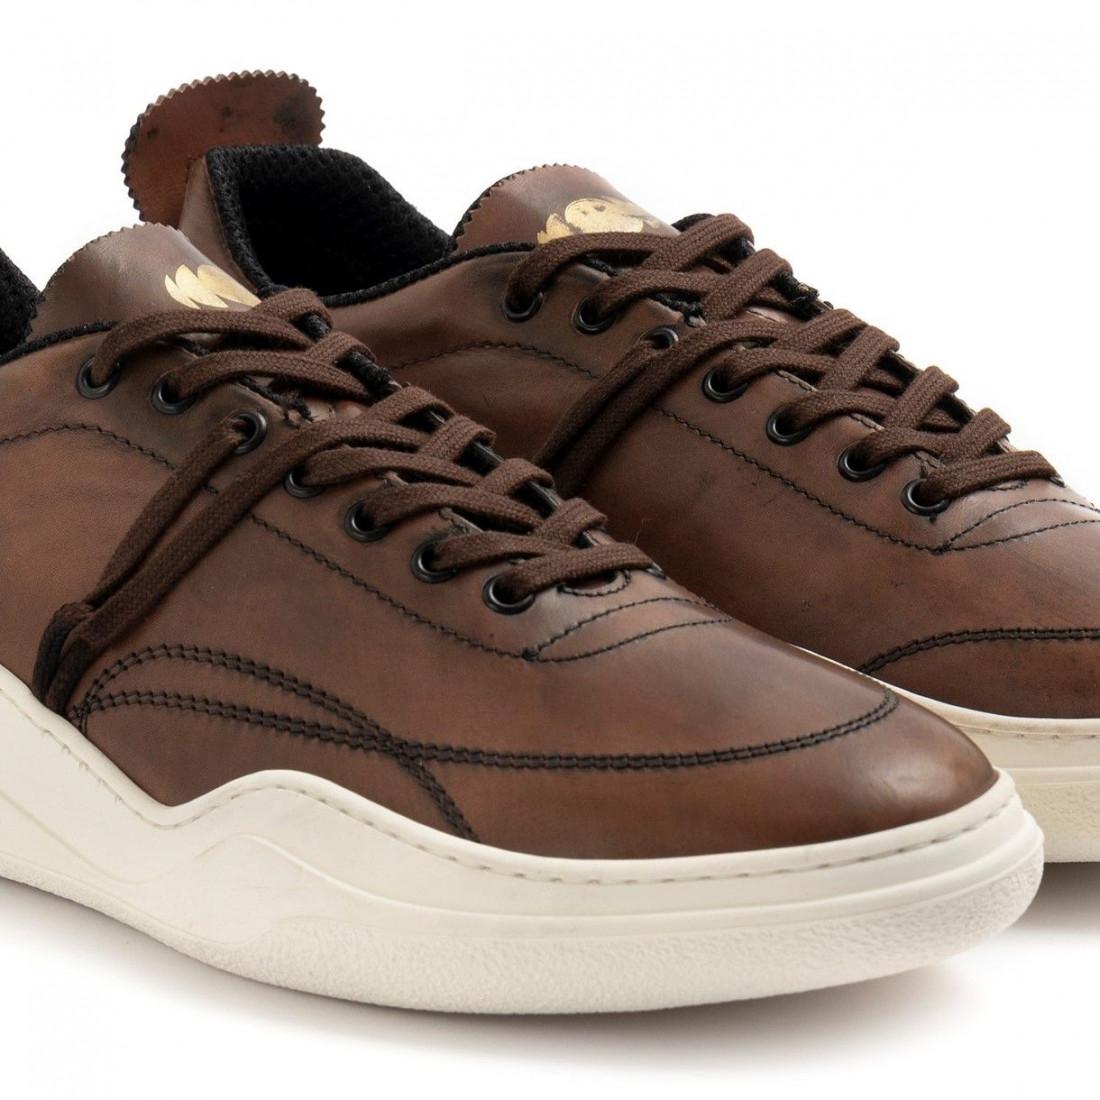 sneakers uomo pantofola doro sss3wu2148 8429